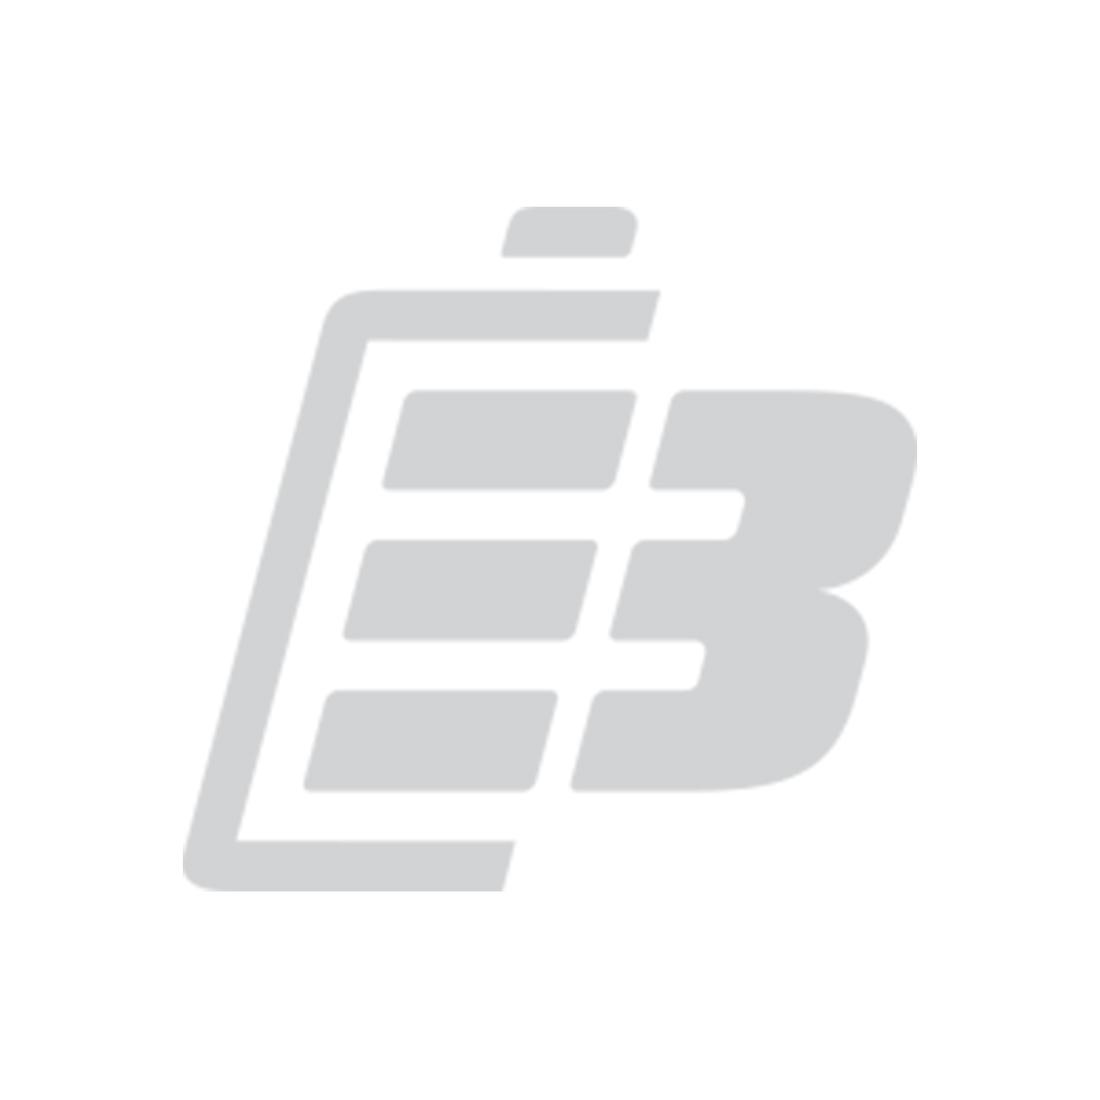 Cordless phone battery SwissVoice DP500_1